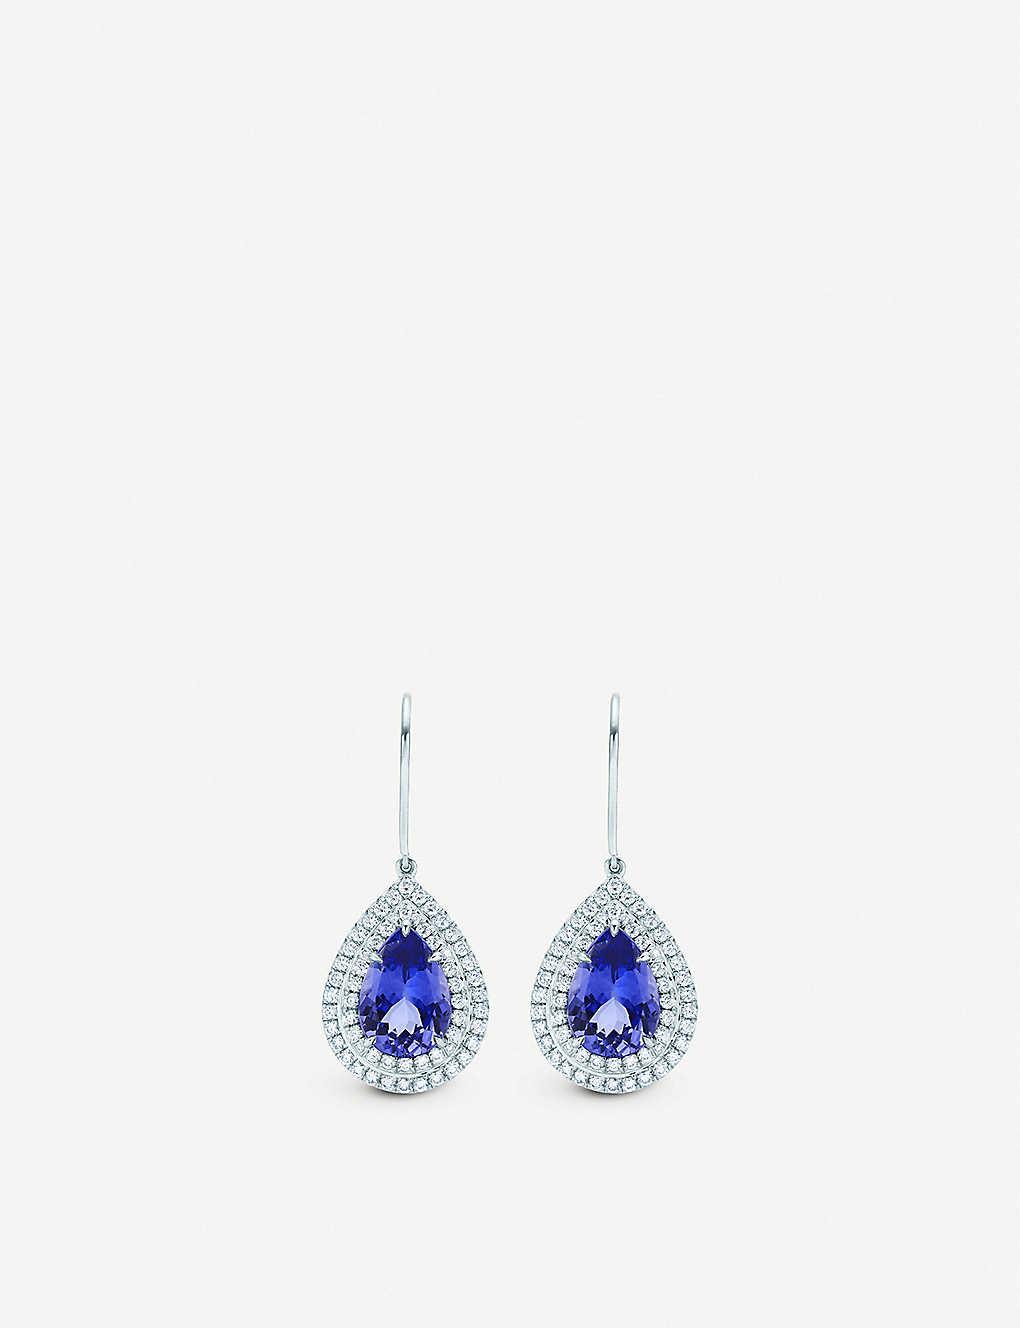 5dcb0ebd5 TIFFANY & CO - Soleste platinum, diamond and tanzanite earrings ...